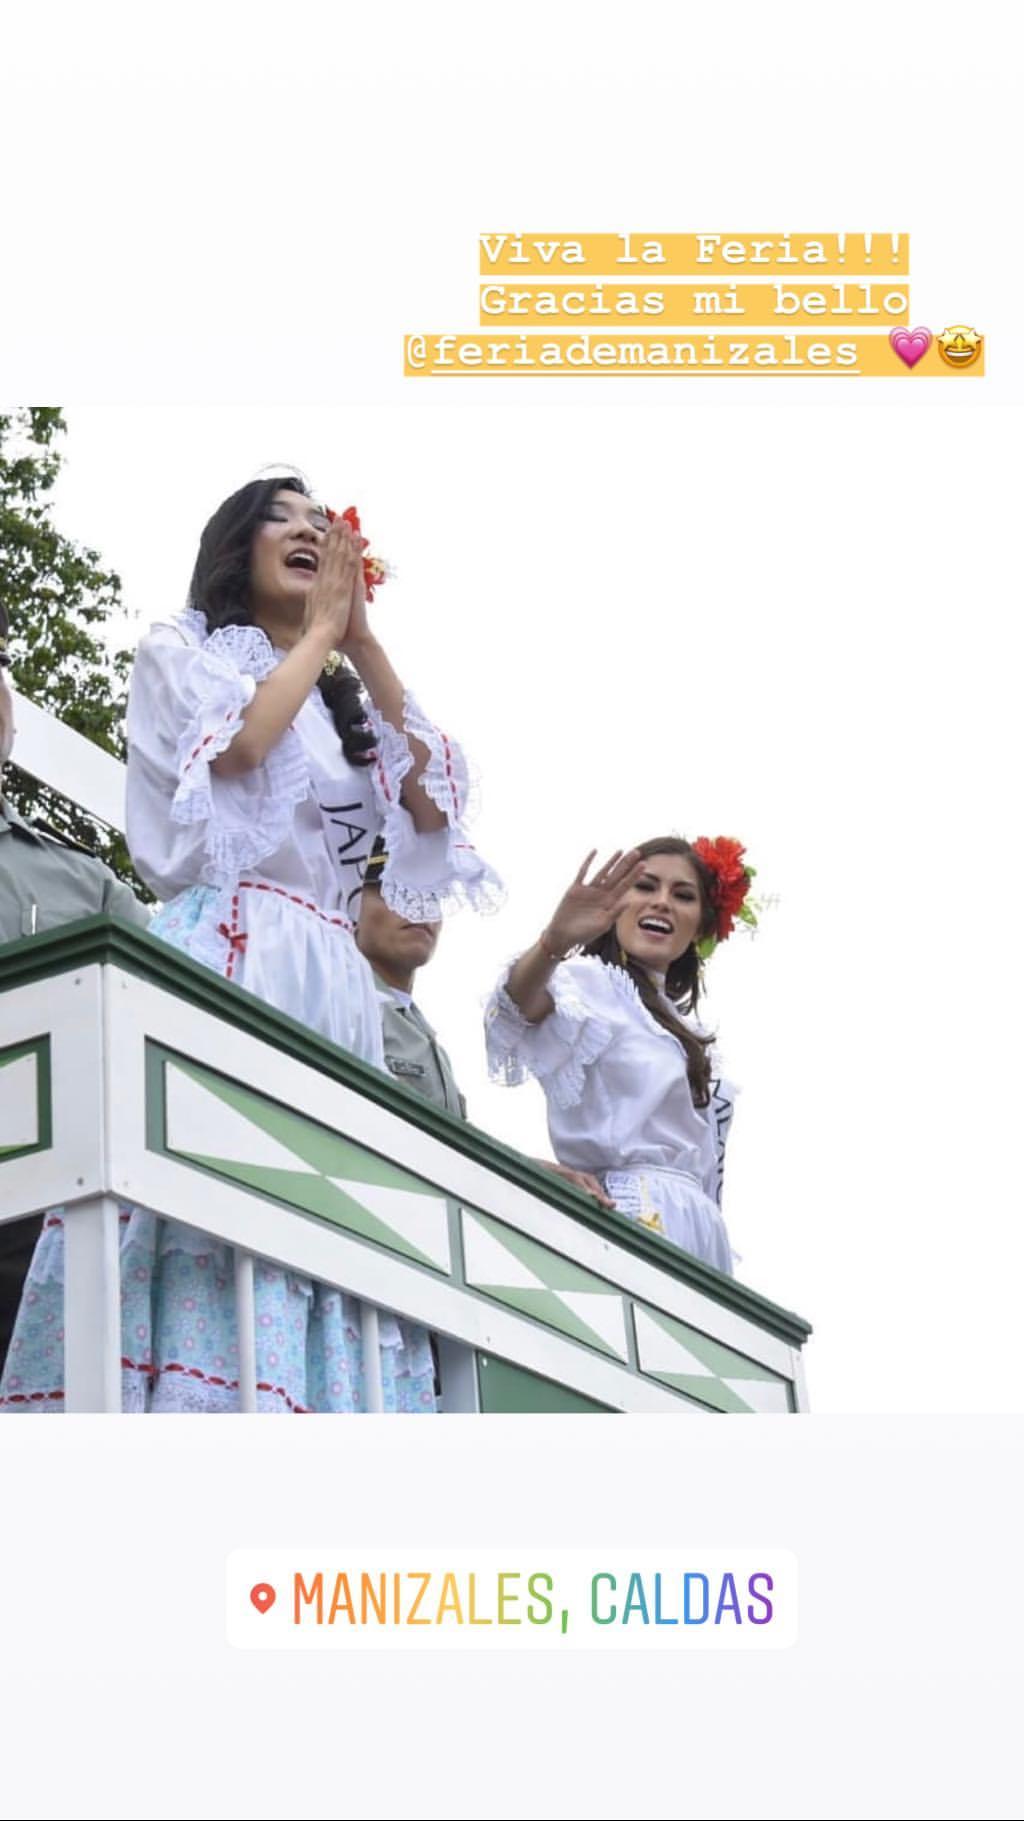 monica hernandez reynaga, mexico para reynado internacional cafe 2019. - Página 2 47692611